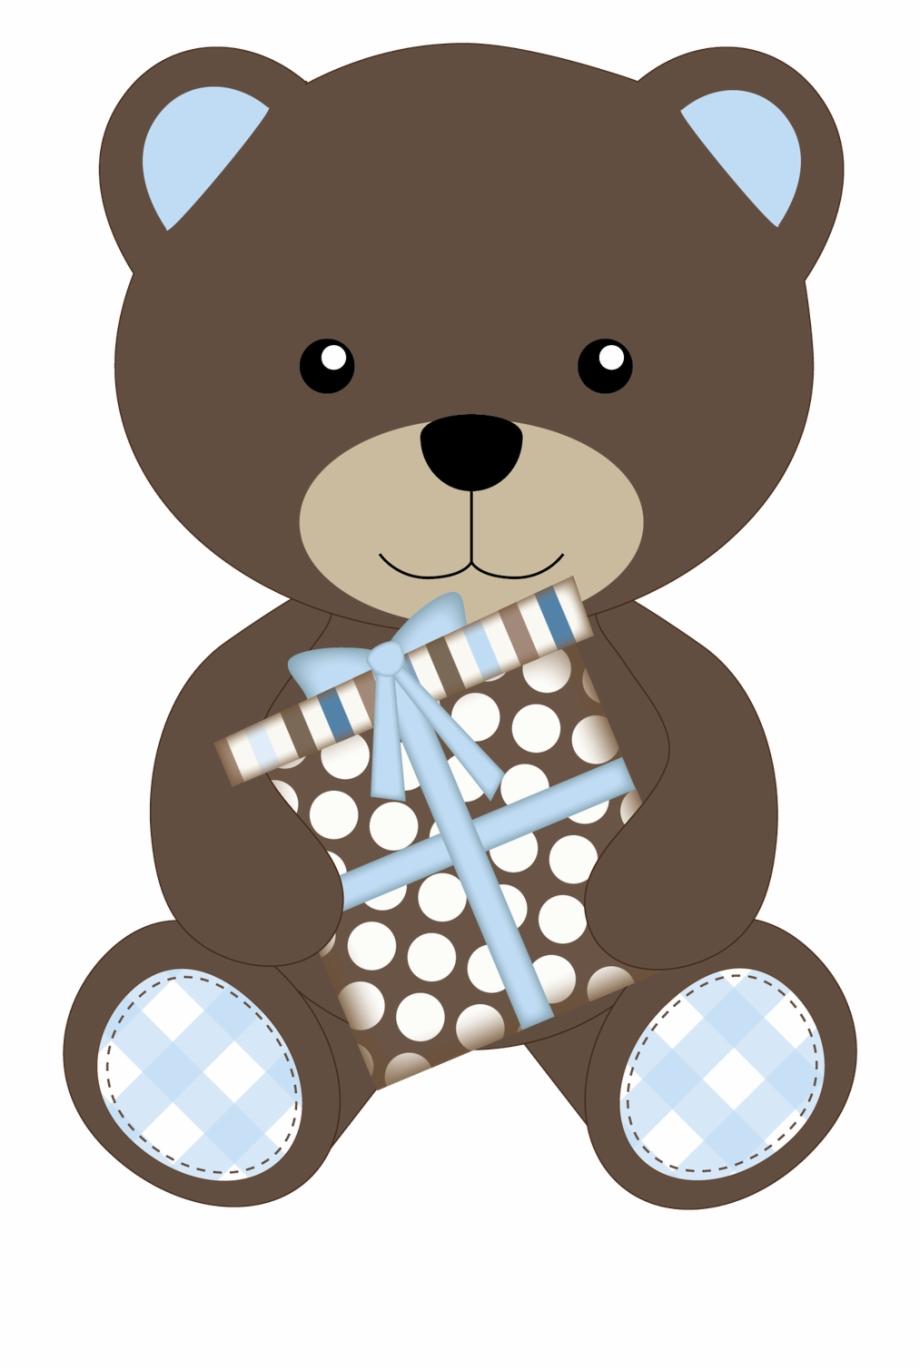 Teddy bear clipart pinterest vector transparent stock Ursinhos E Ursinhas Minus Pinterest Bears Teddy - Teddy Bear ... vector transparent stock